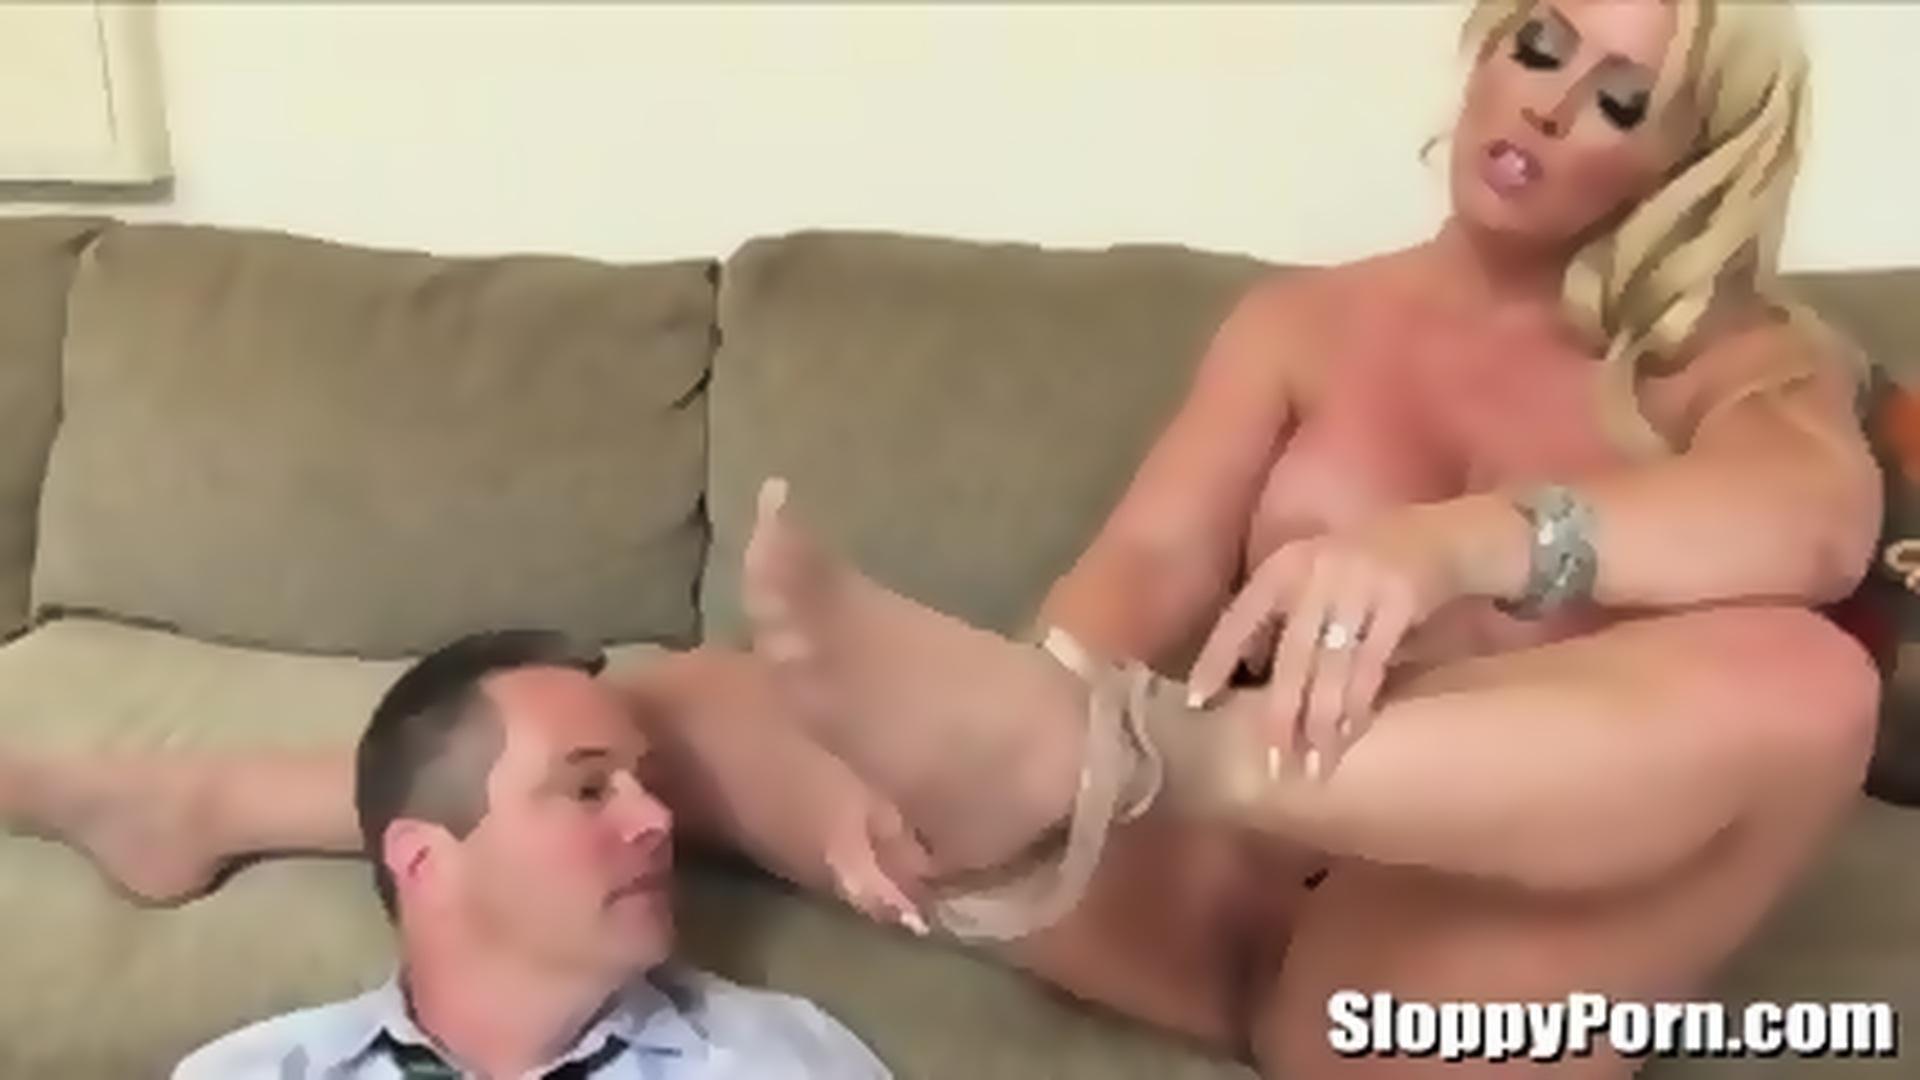 Bittorrent porno film download